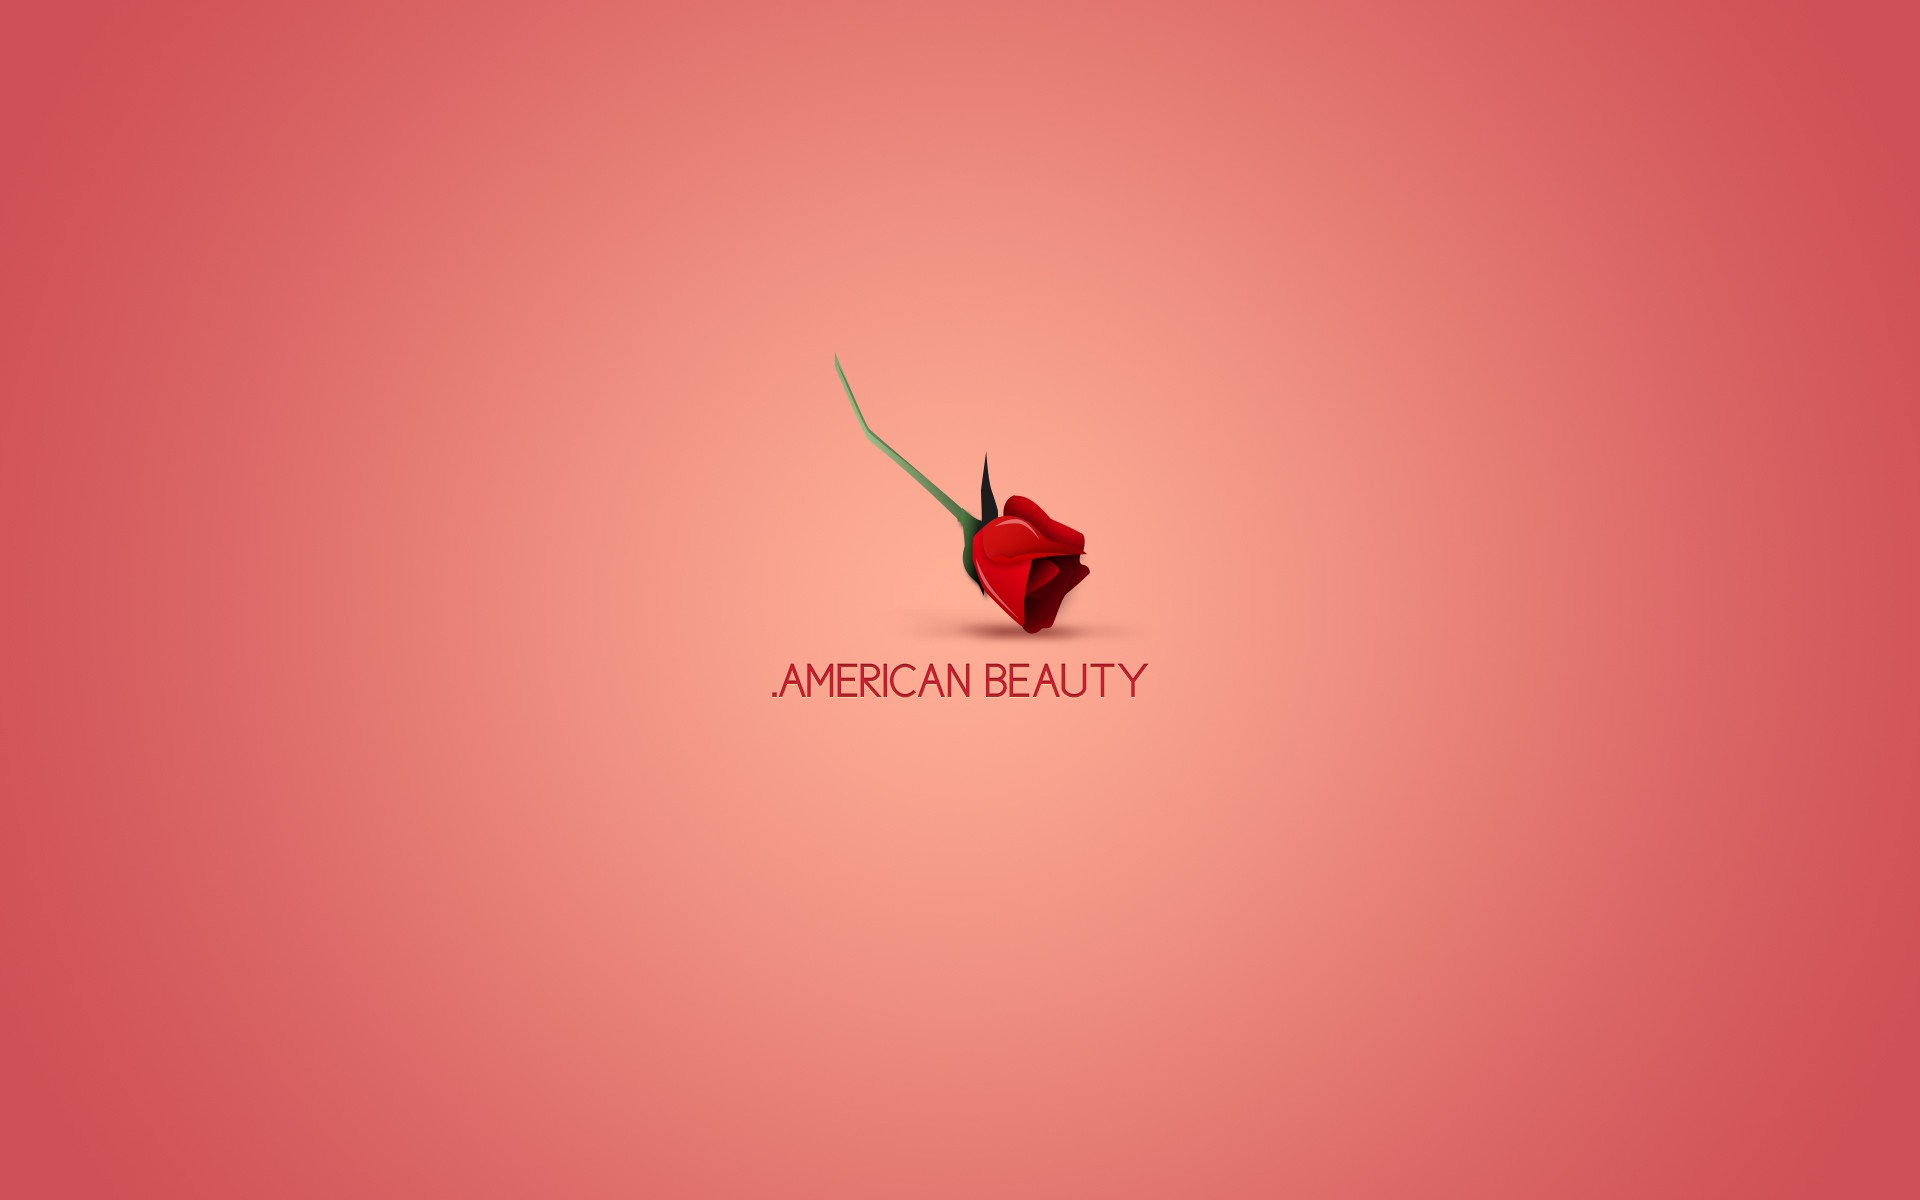 Minimalistic movies American Beauty wallpaper   1920x1200 ...